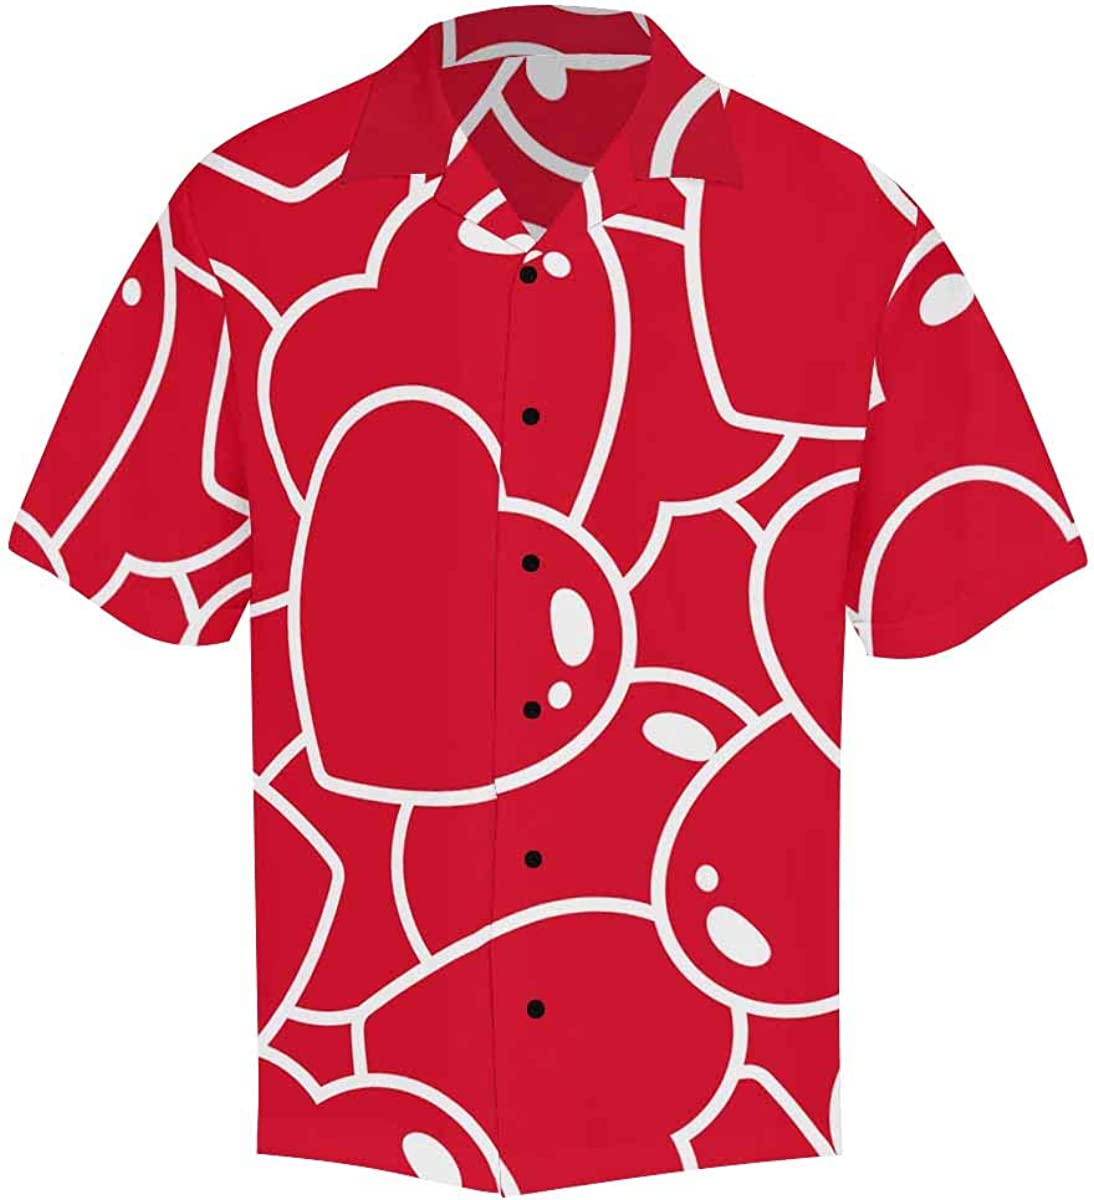 InterestPrint Men's Casual Button Down Short Sleeve Scary Skull Hawaiian Shirt (S-5XL)